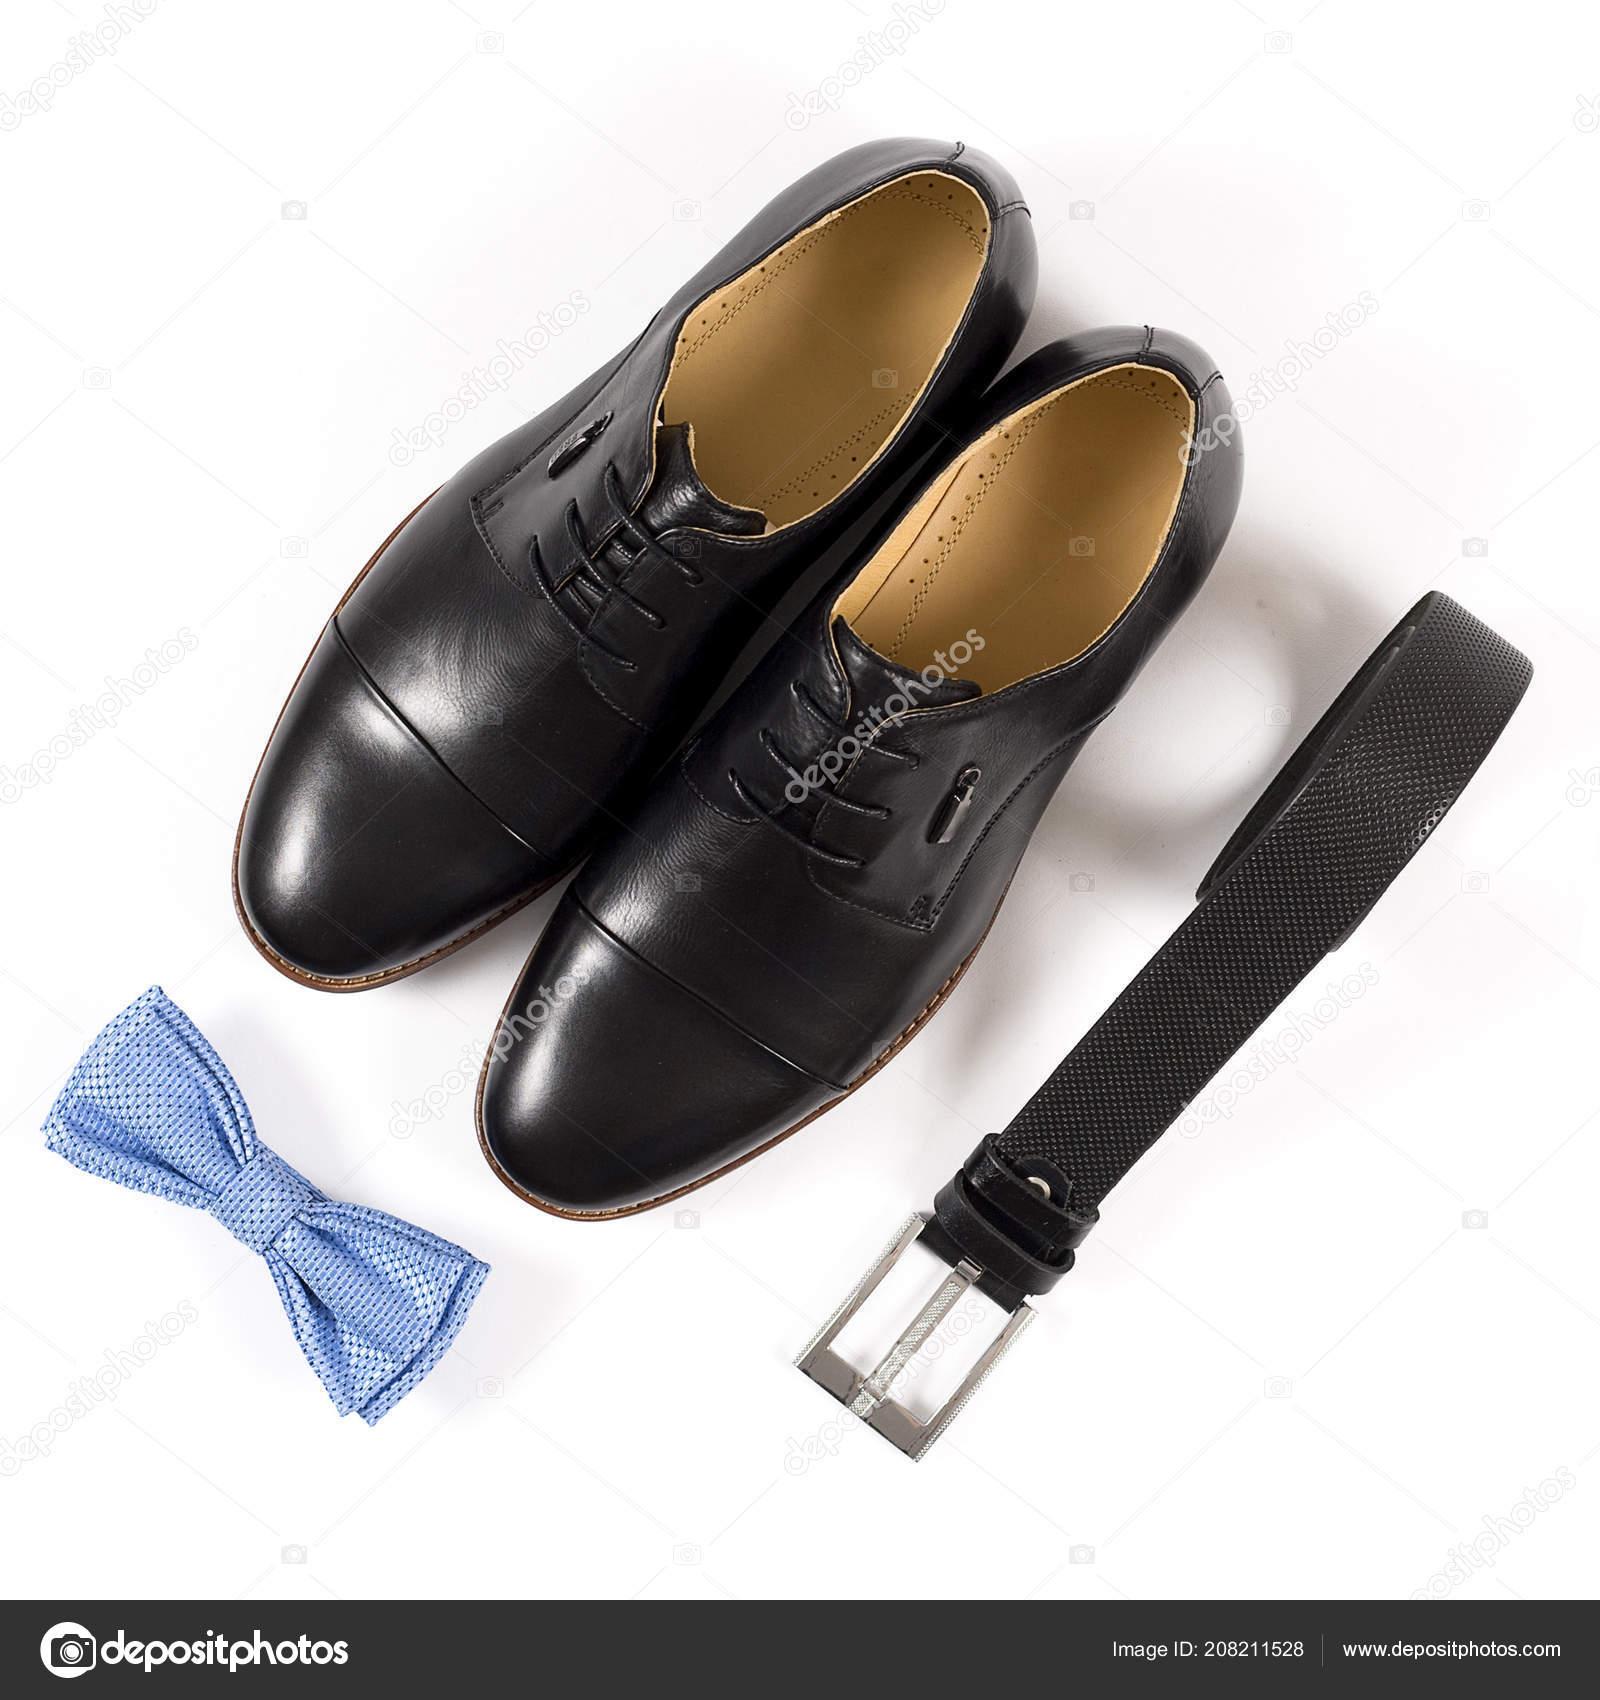 3b6d0254dcb Ανδρικά Δερμάτινα Παπούτσια Και Ζώνη Λευκό Φόντο — Φωτογραφία ...